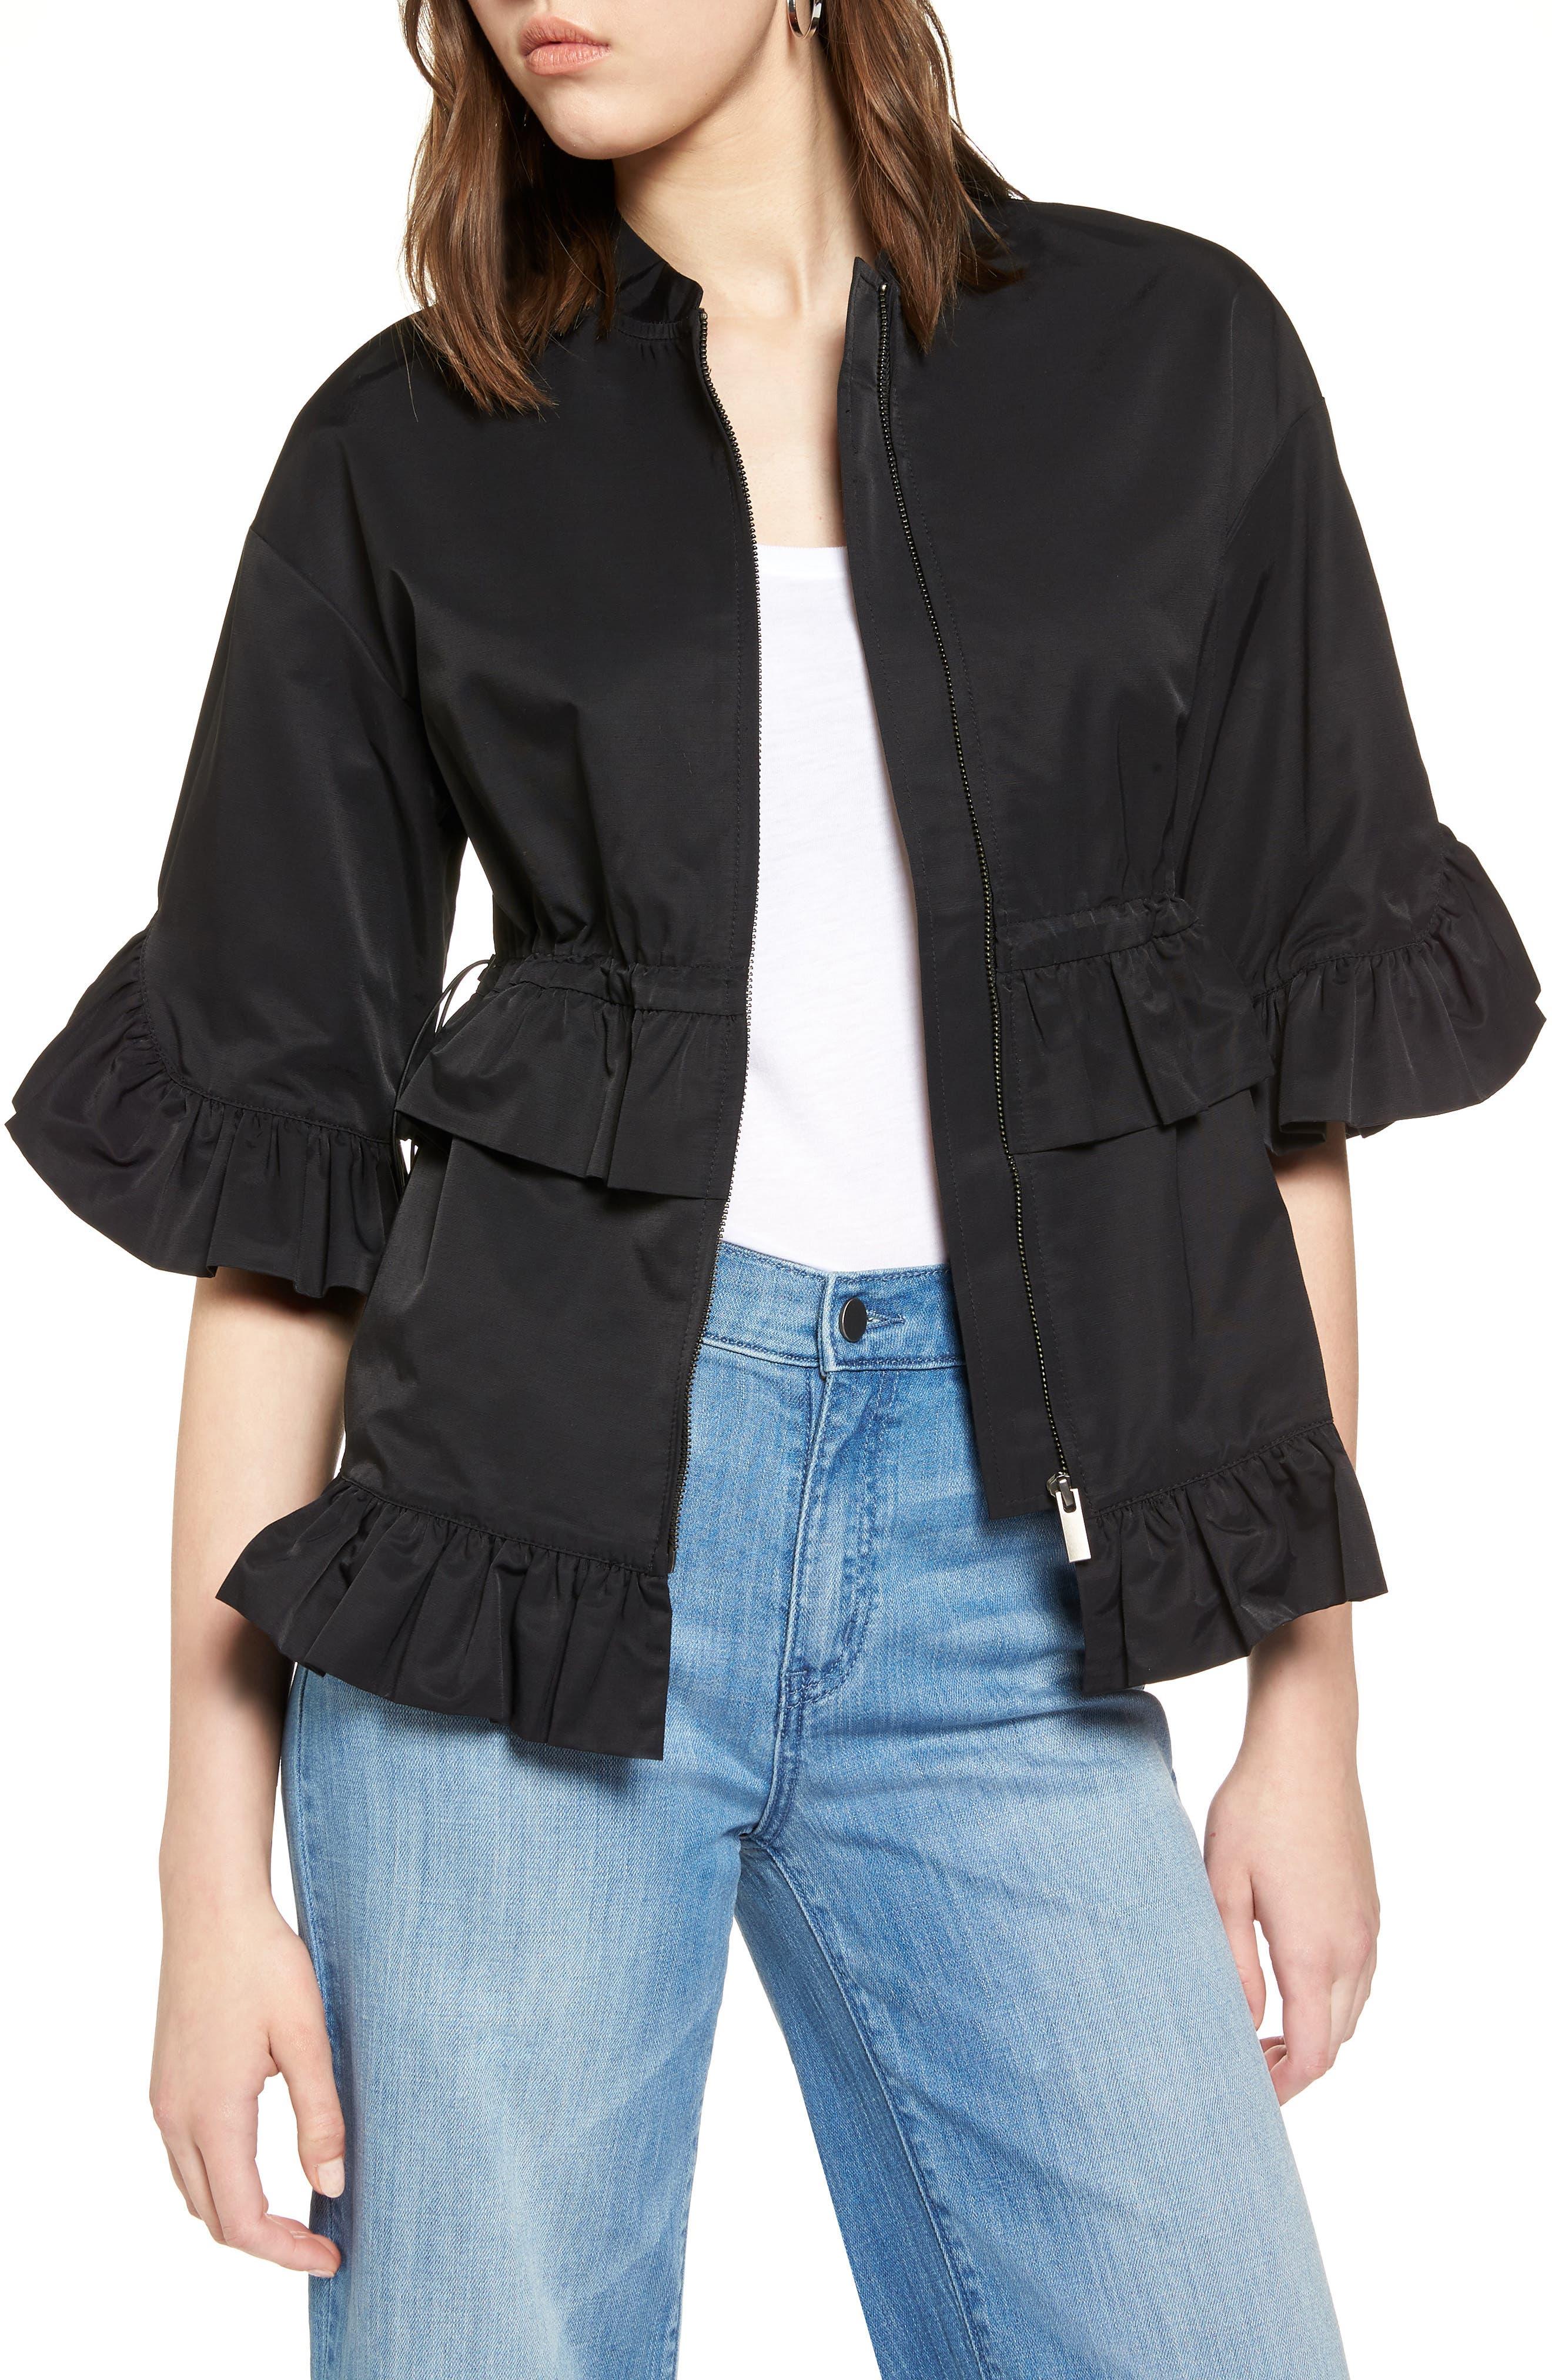 Alternate Image 1 Selected - Halogen® Ruffle Zip Jacket (Regular & Petite)